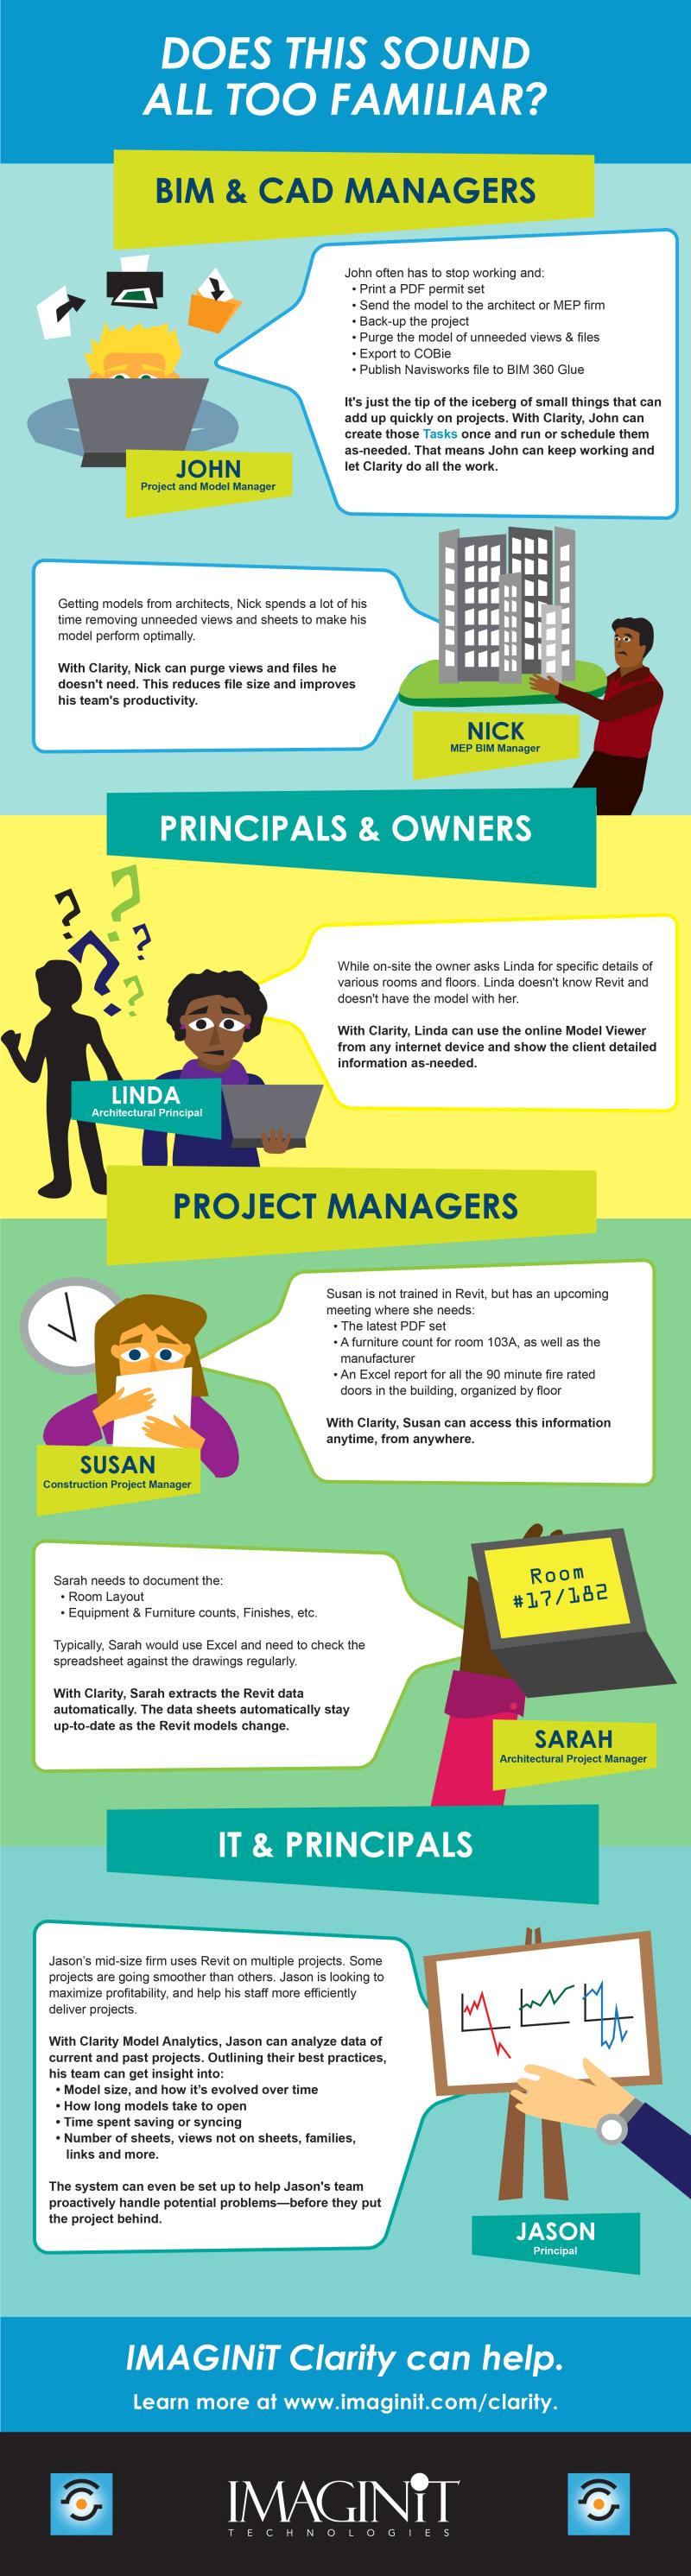 IMAGINiT_Clarity_Infographic